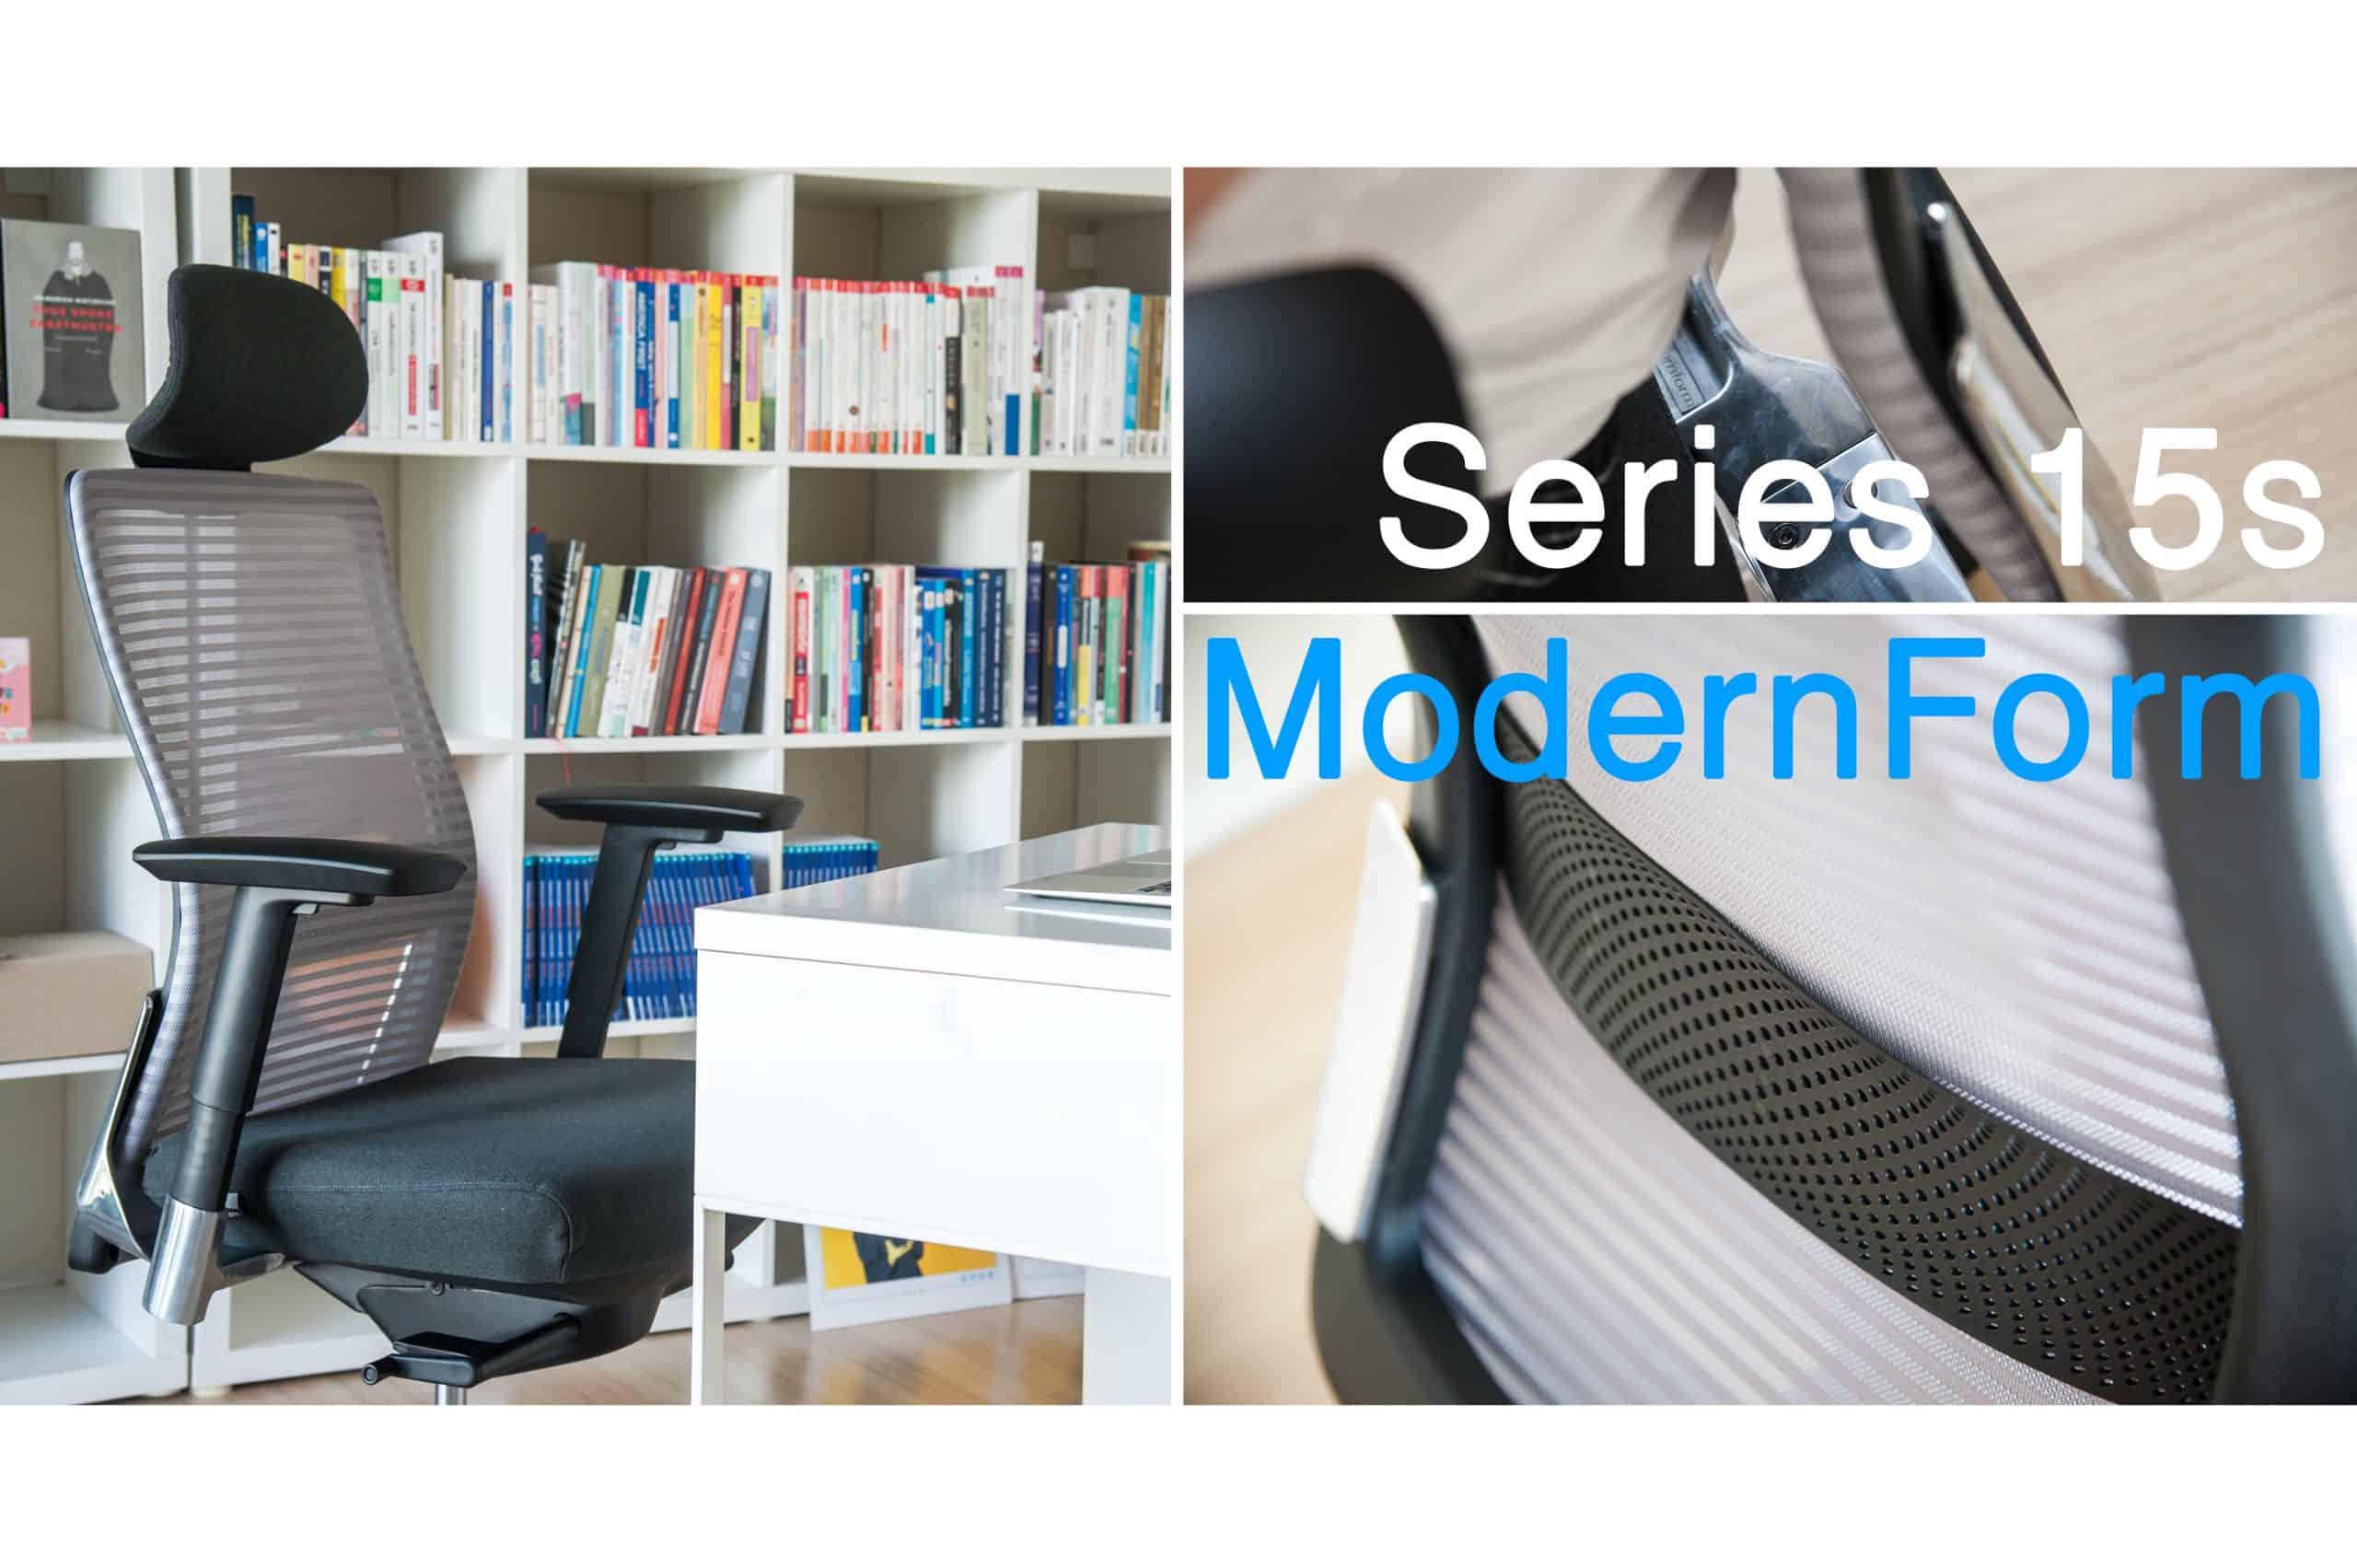 Series 15s เก้าอี้ทำงานไม่ปวดหลังในราคาย่อมเยาว์จาก ModernForm